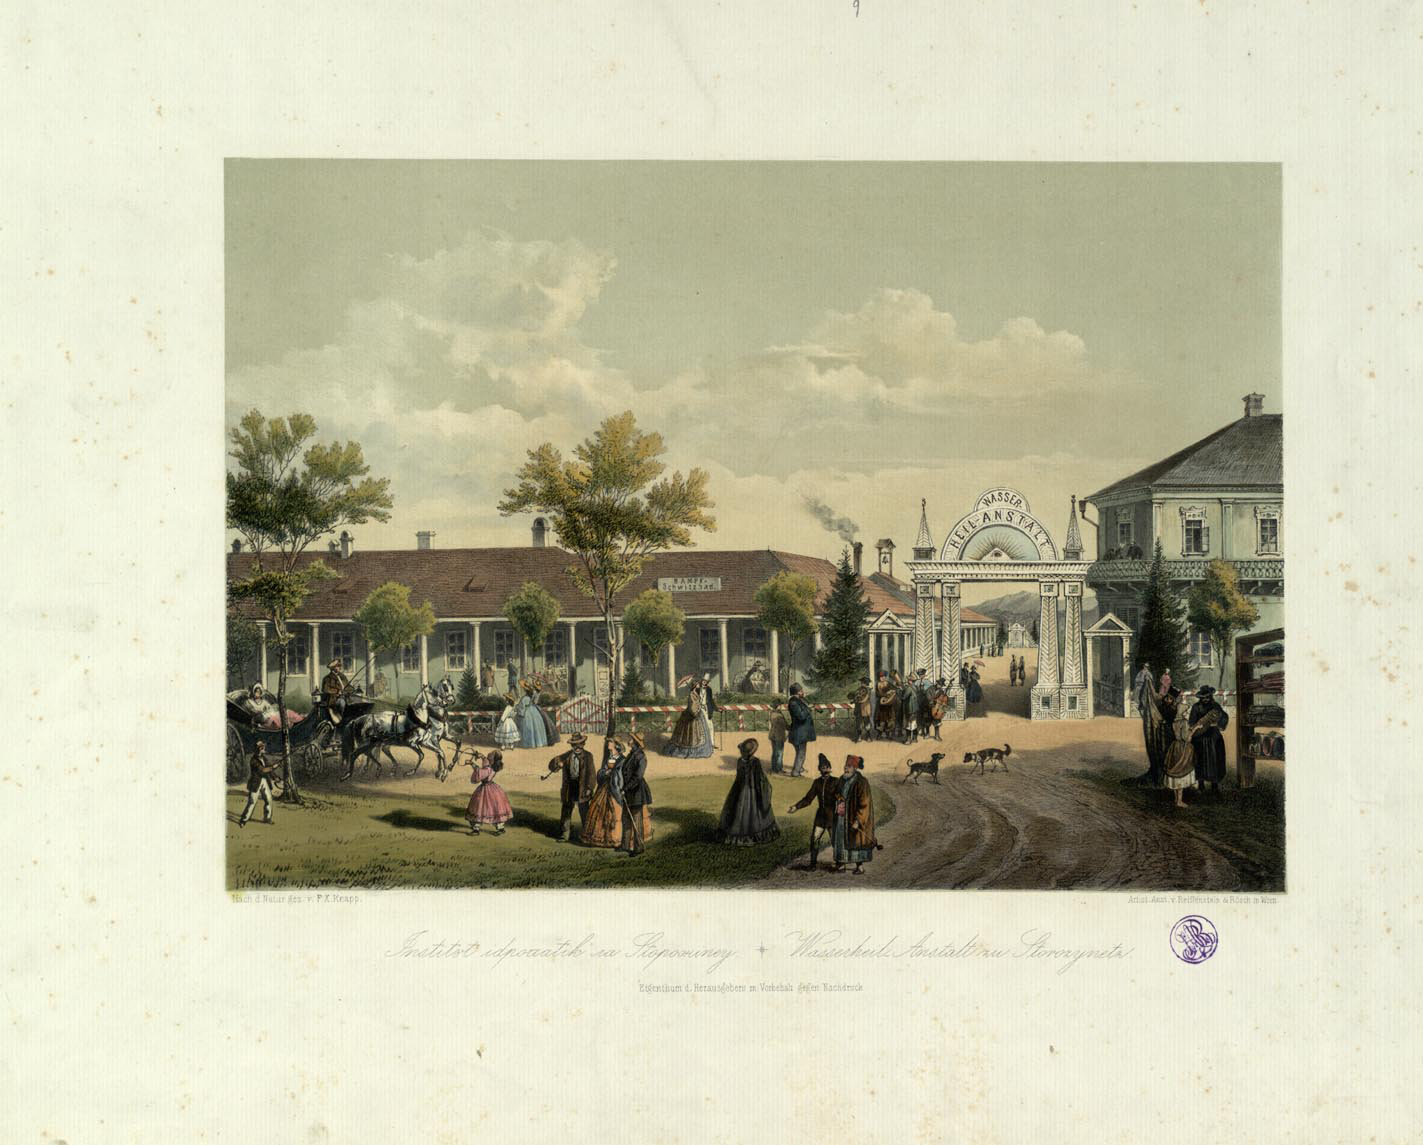 Institutul idropatik la Storozineţ ; Wasserheil - Anstalt zu Storozynetz ; F. X. Knapp ;